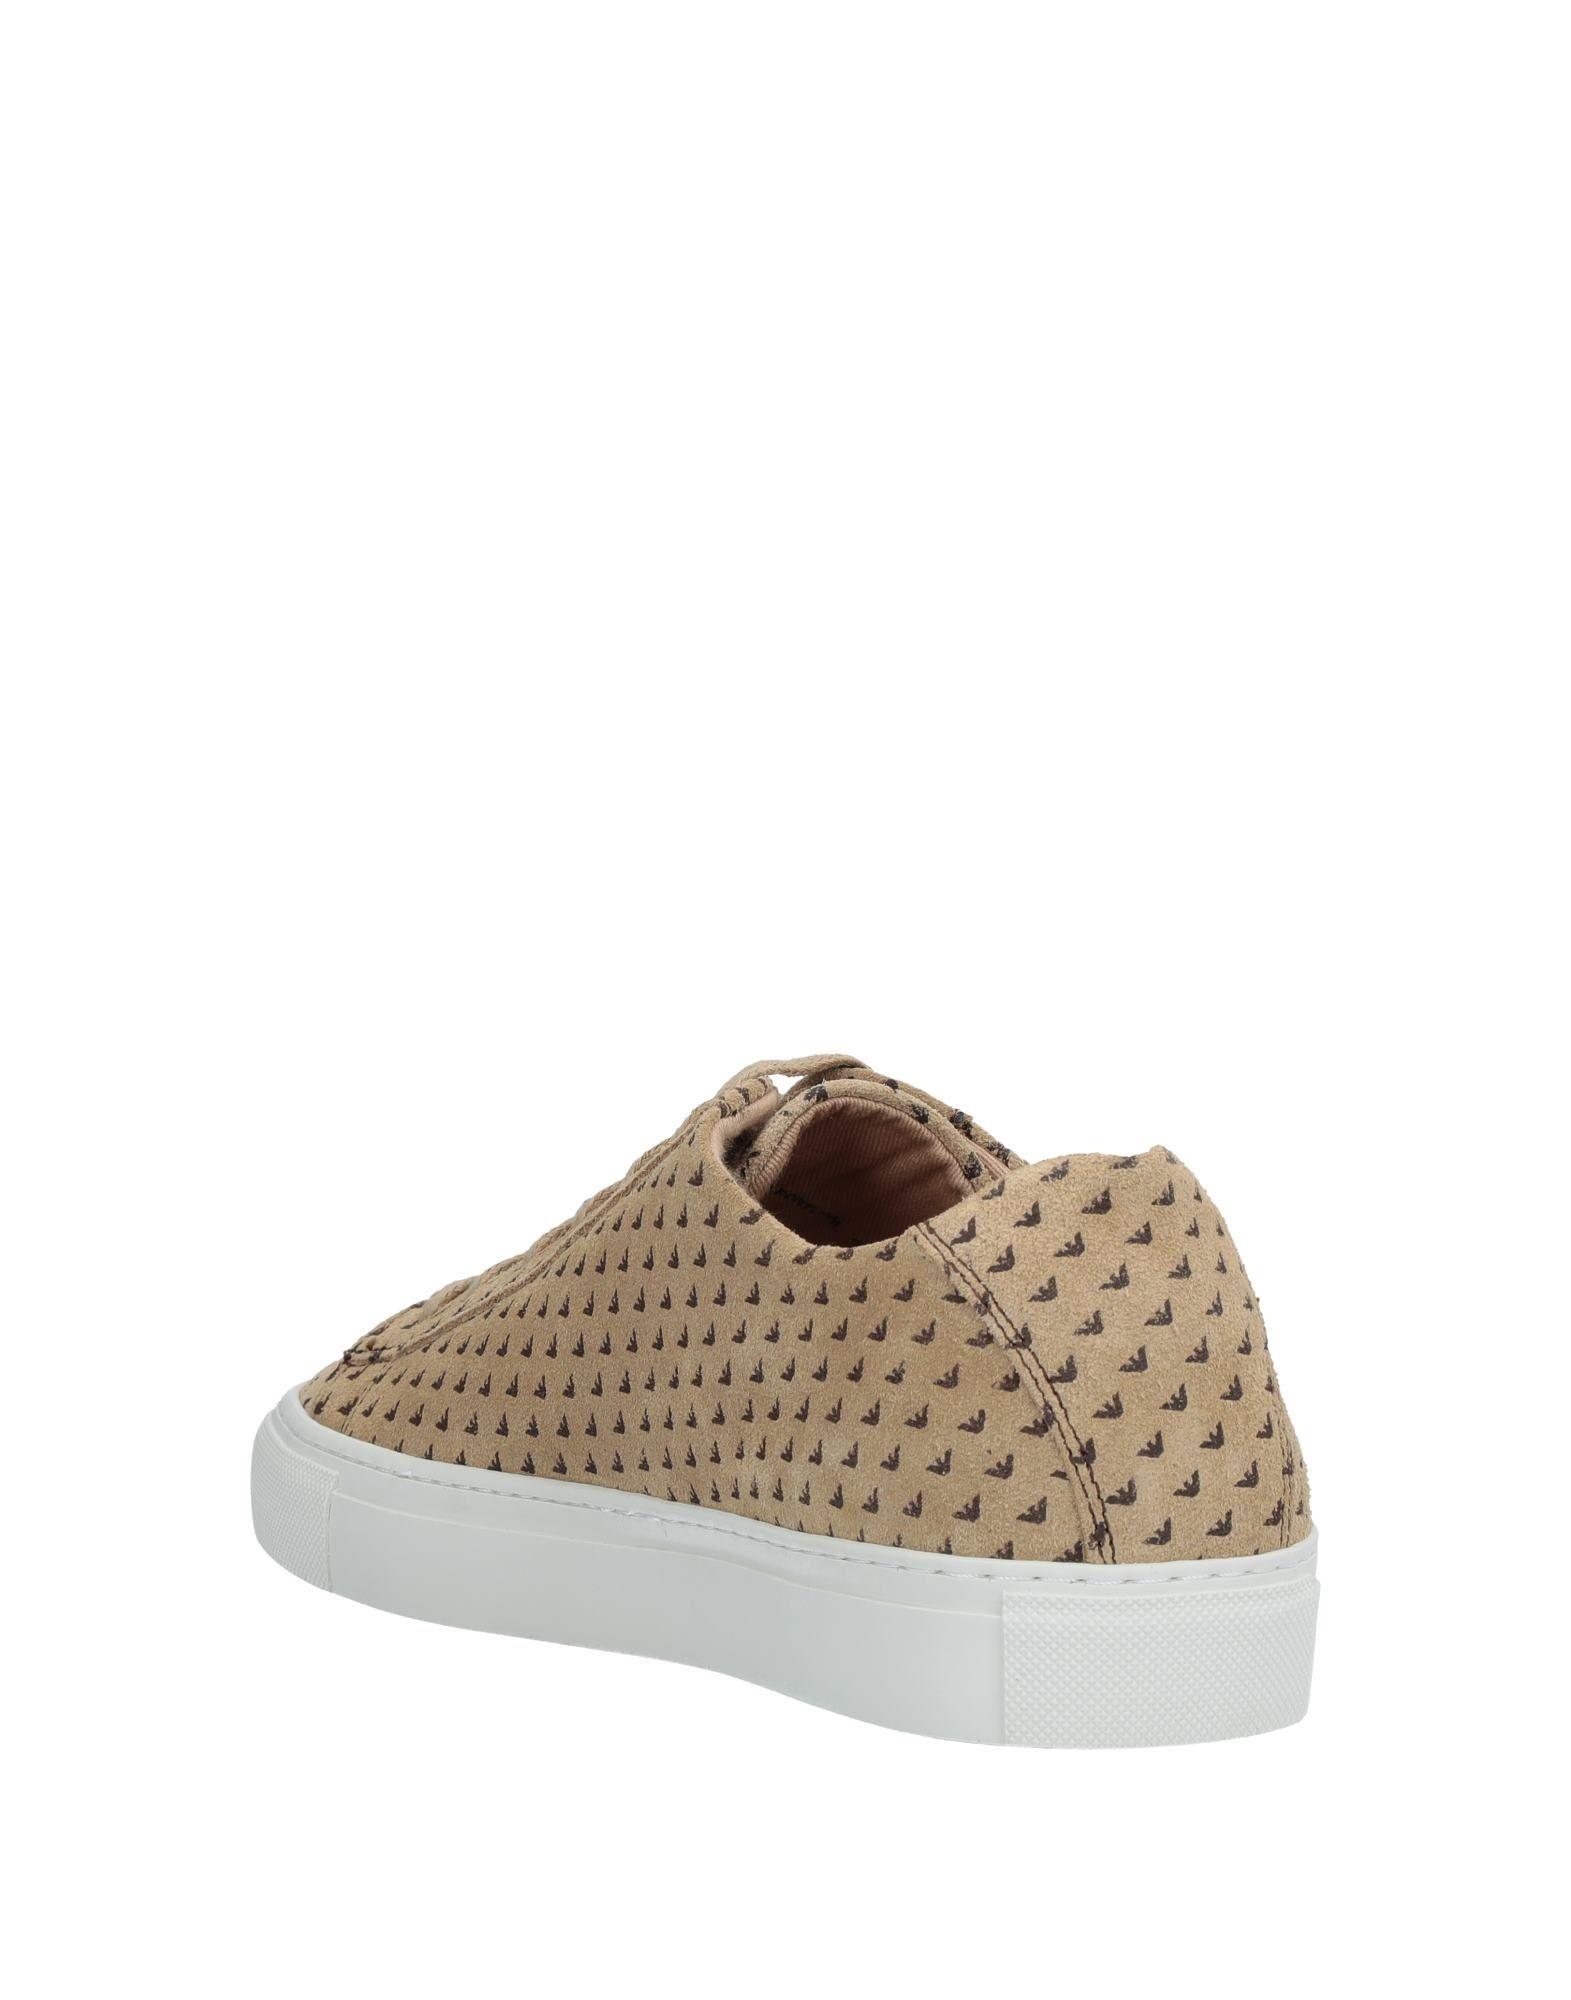 Rabatt echte Schuhe Armani  Jeans Sneakers Herren  Armani 11537618VE effe10